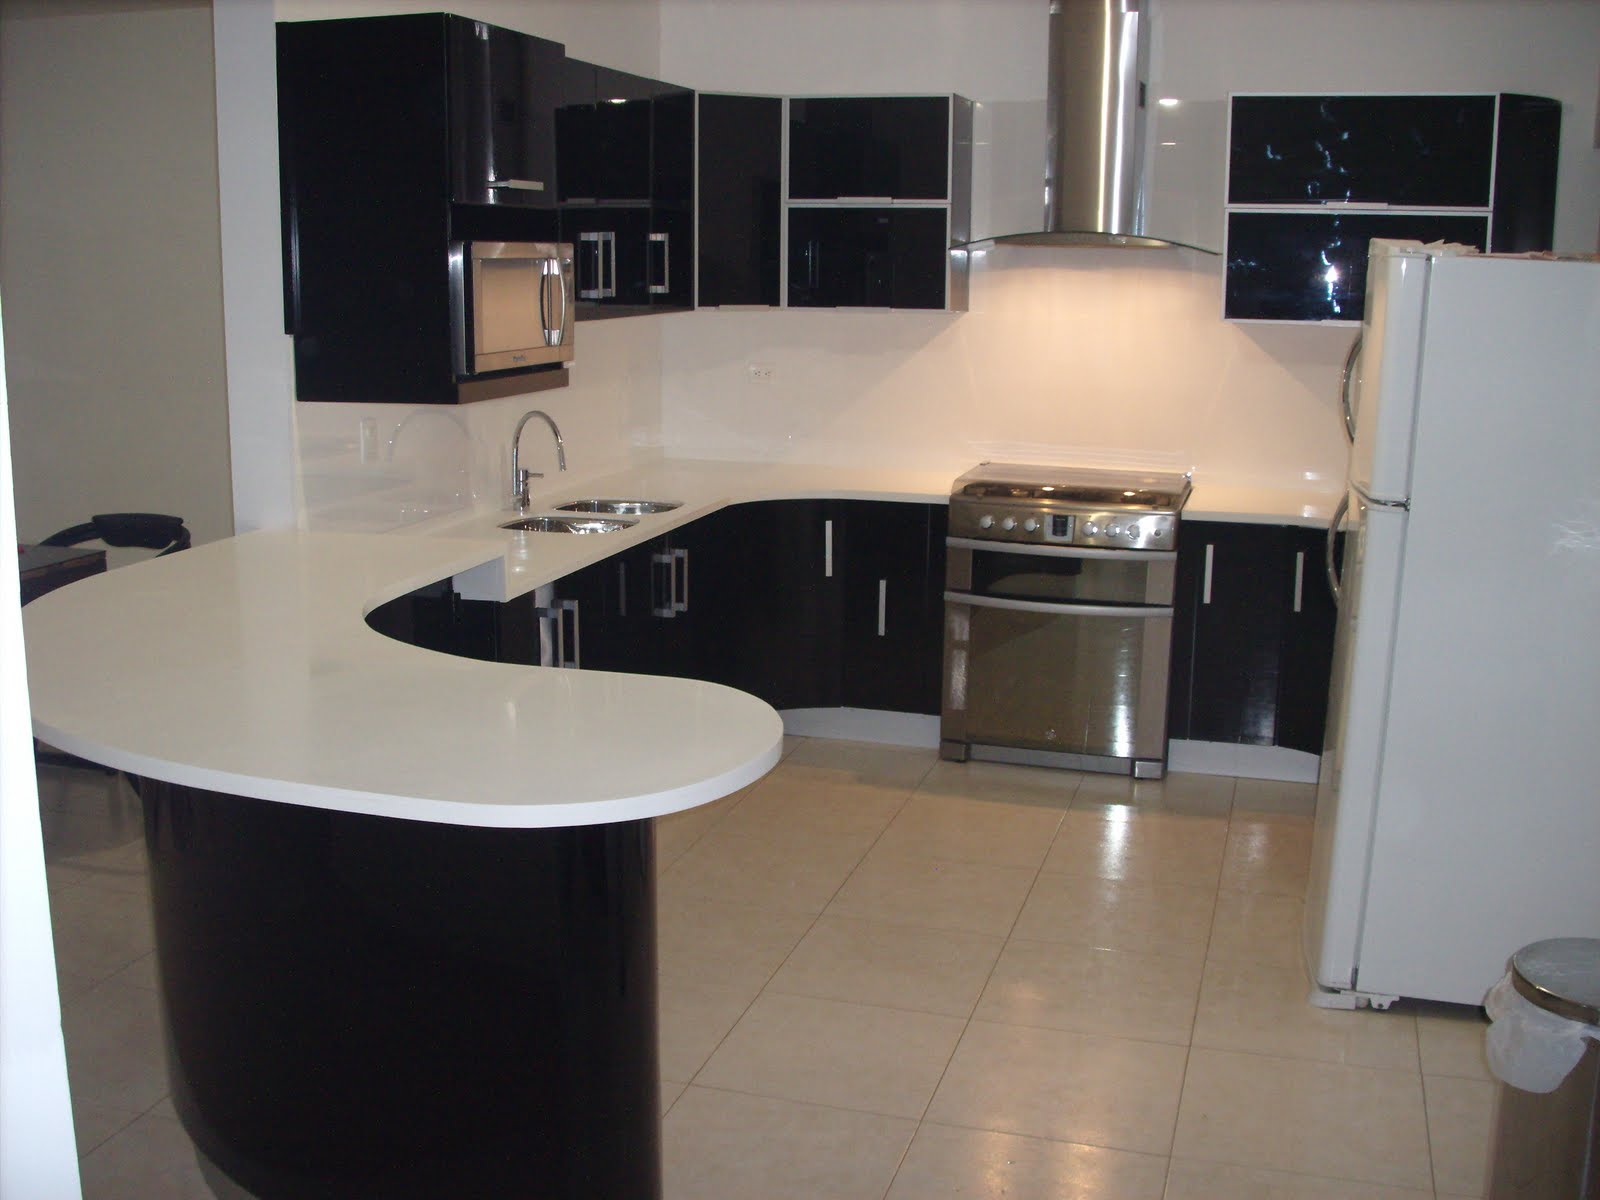 heynez cocinas modernas: Cocina en negro con superficie sólida